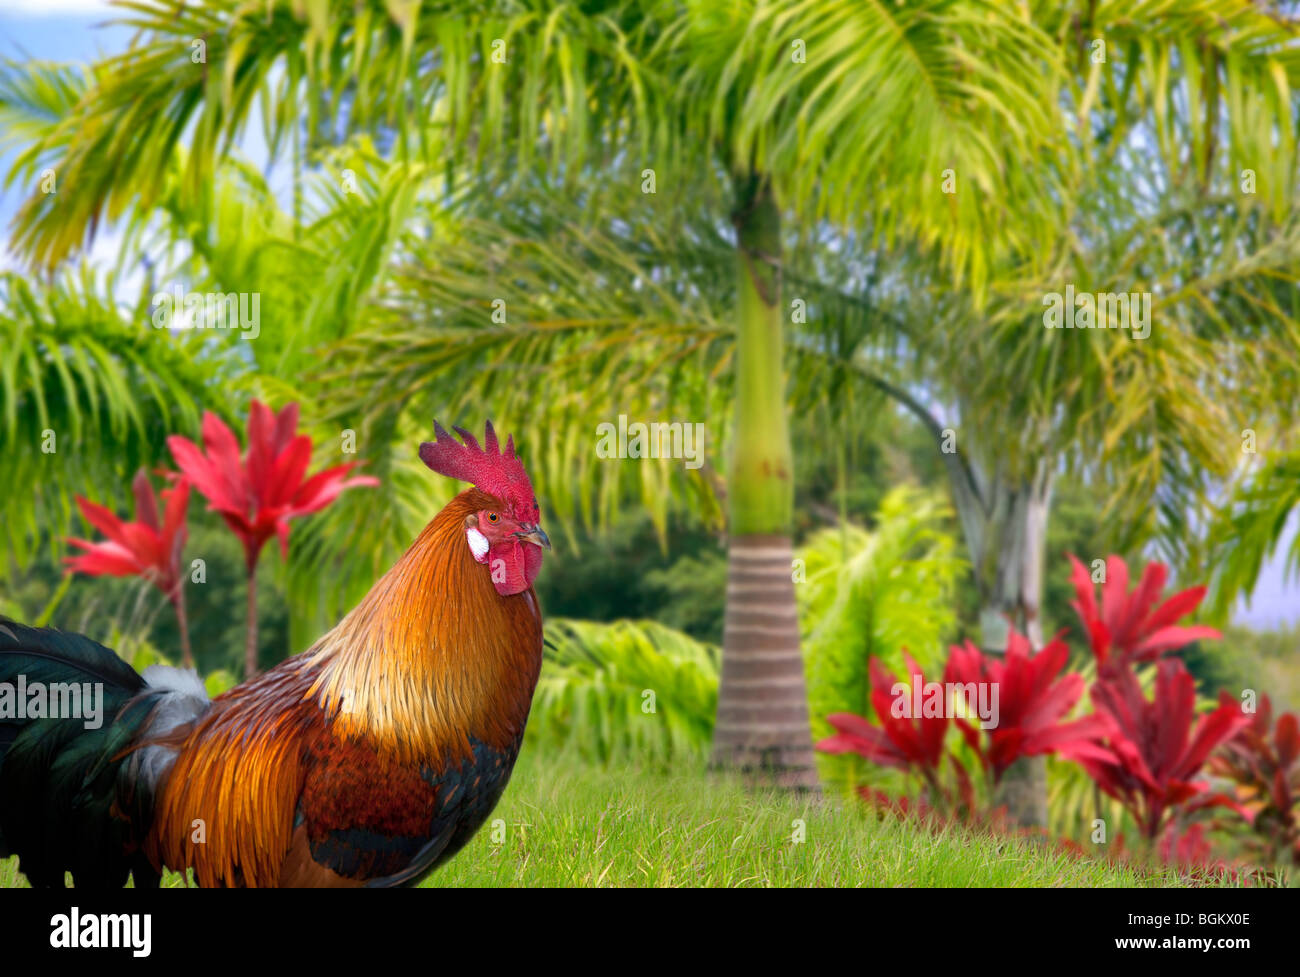 Wild rooster. Kauai, Hawaii - Stock Image